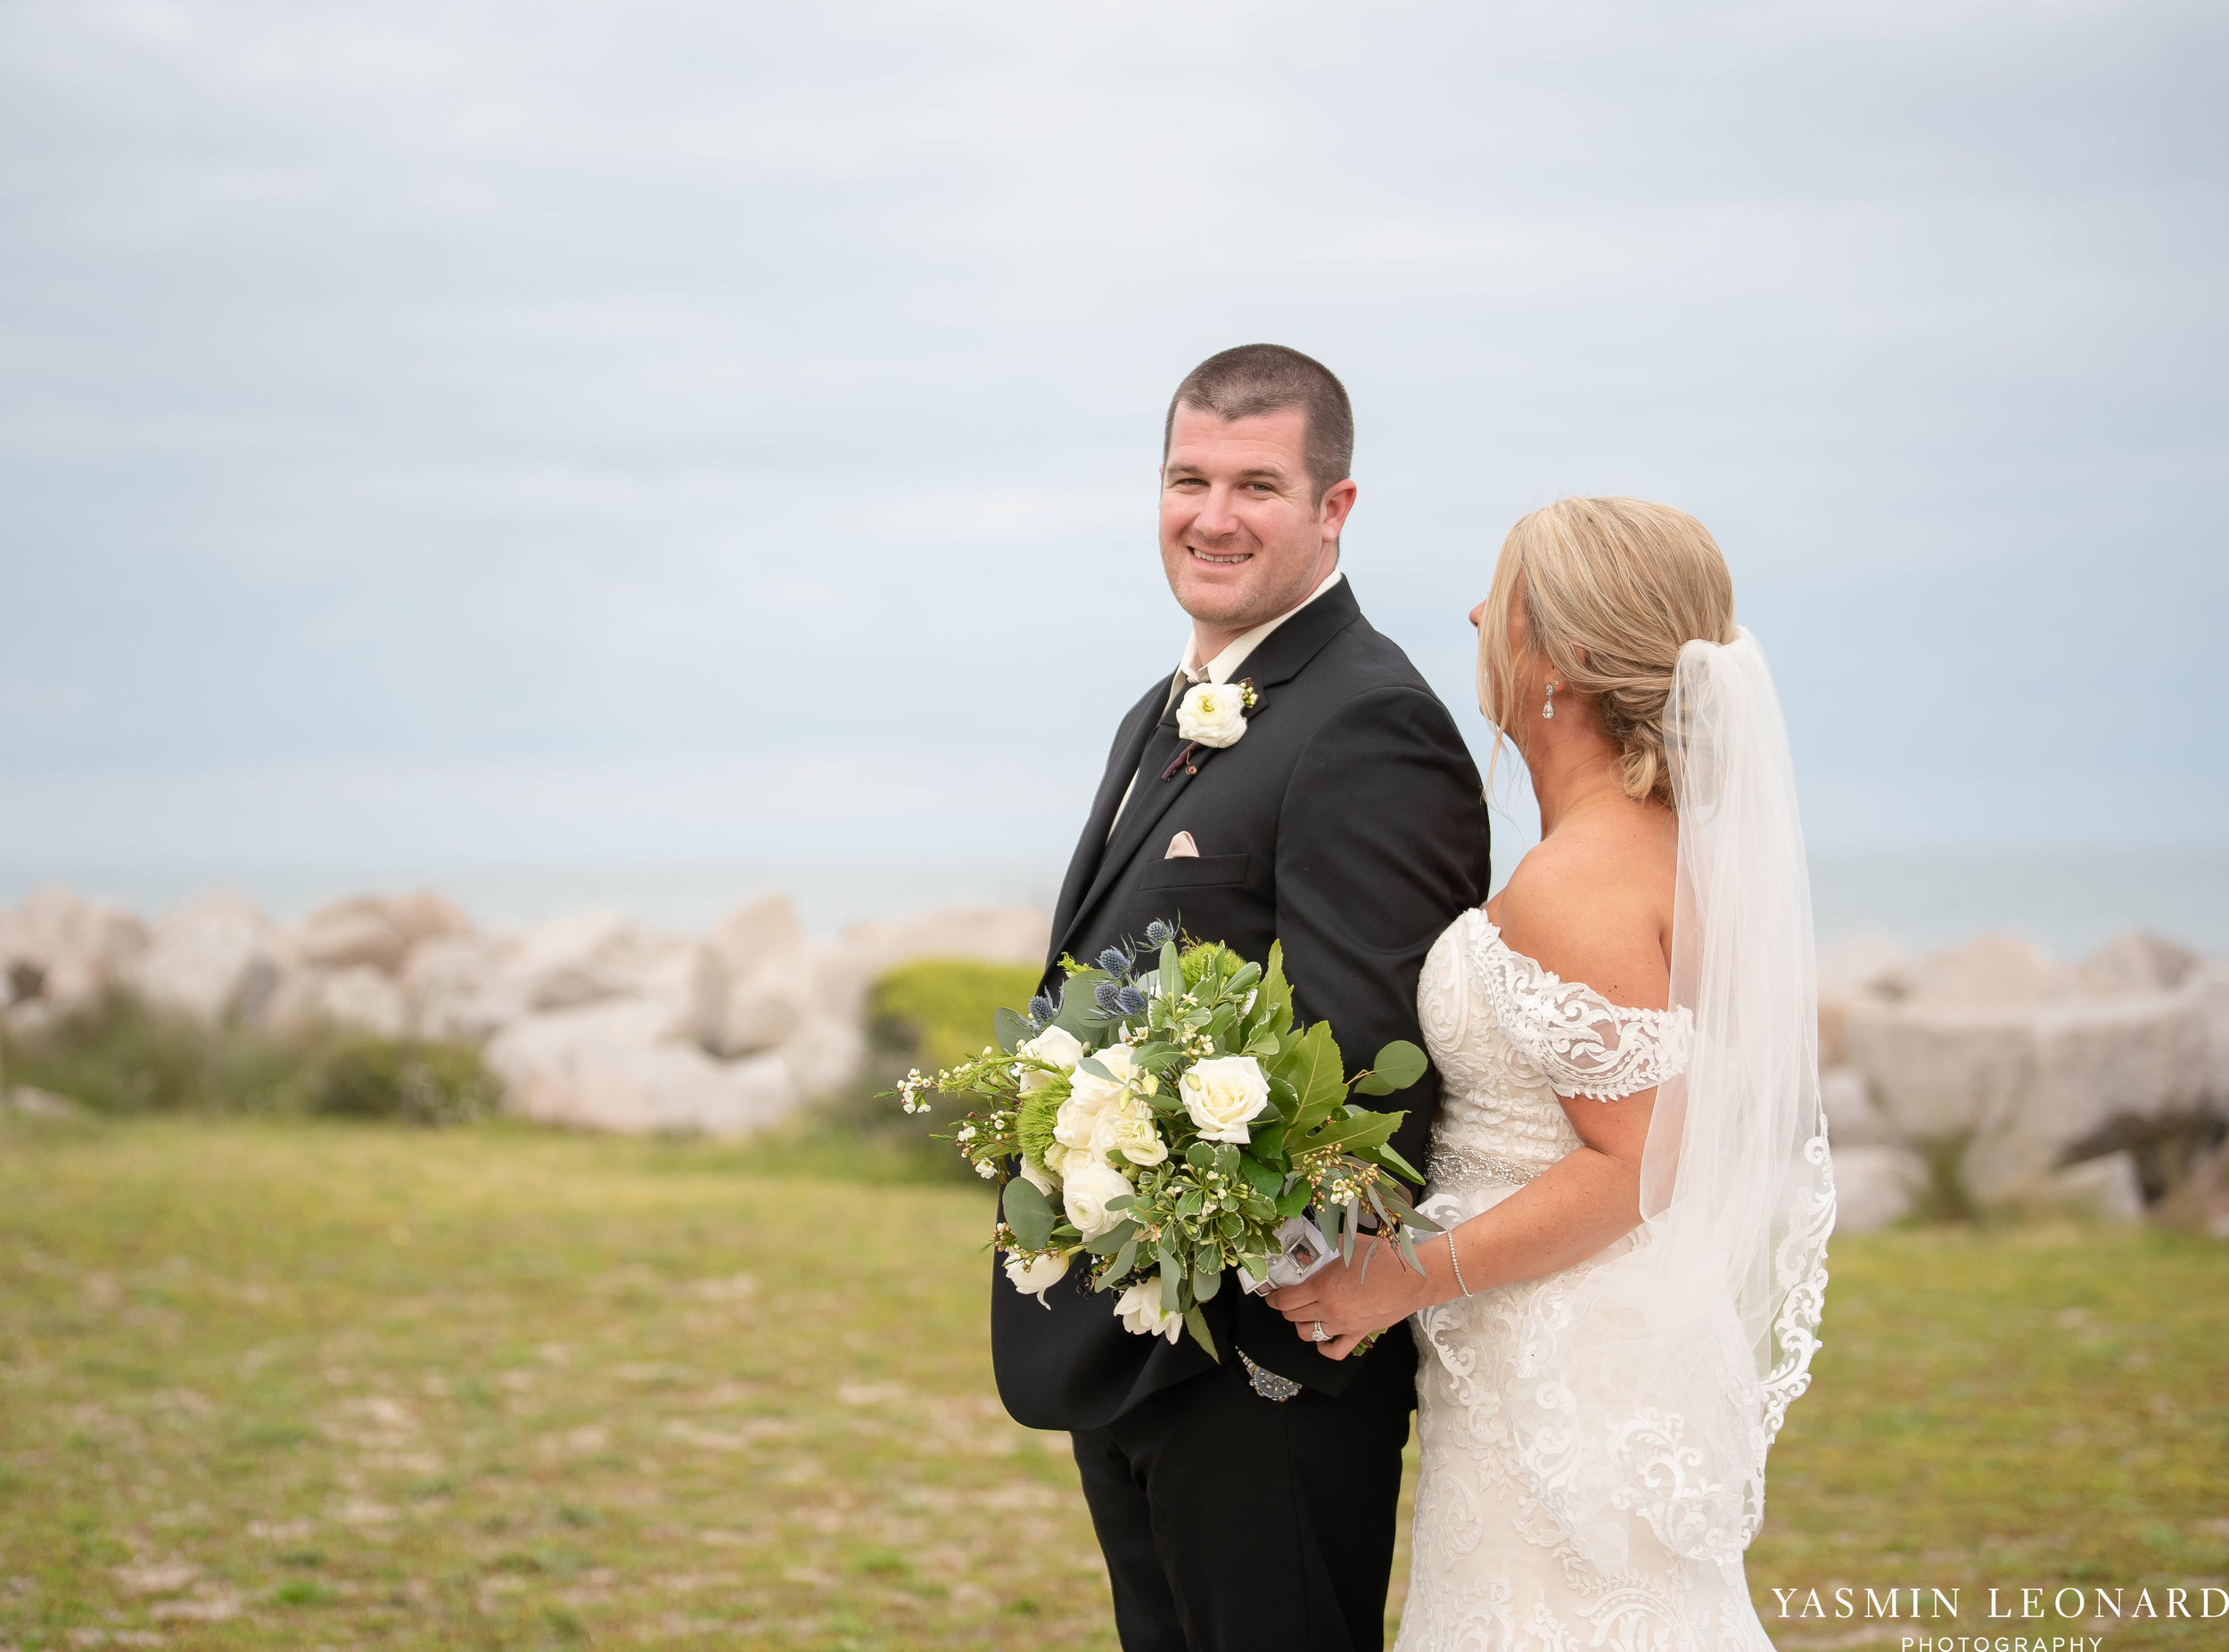 Carolina Beach Wedding - Fort Fisher Wedding - NC Acquarium - Beach Wedding - NC Wedding - Beach Wedding Inspiration - Beach Bride-32.jpg